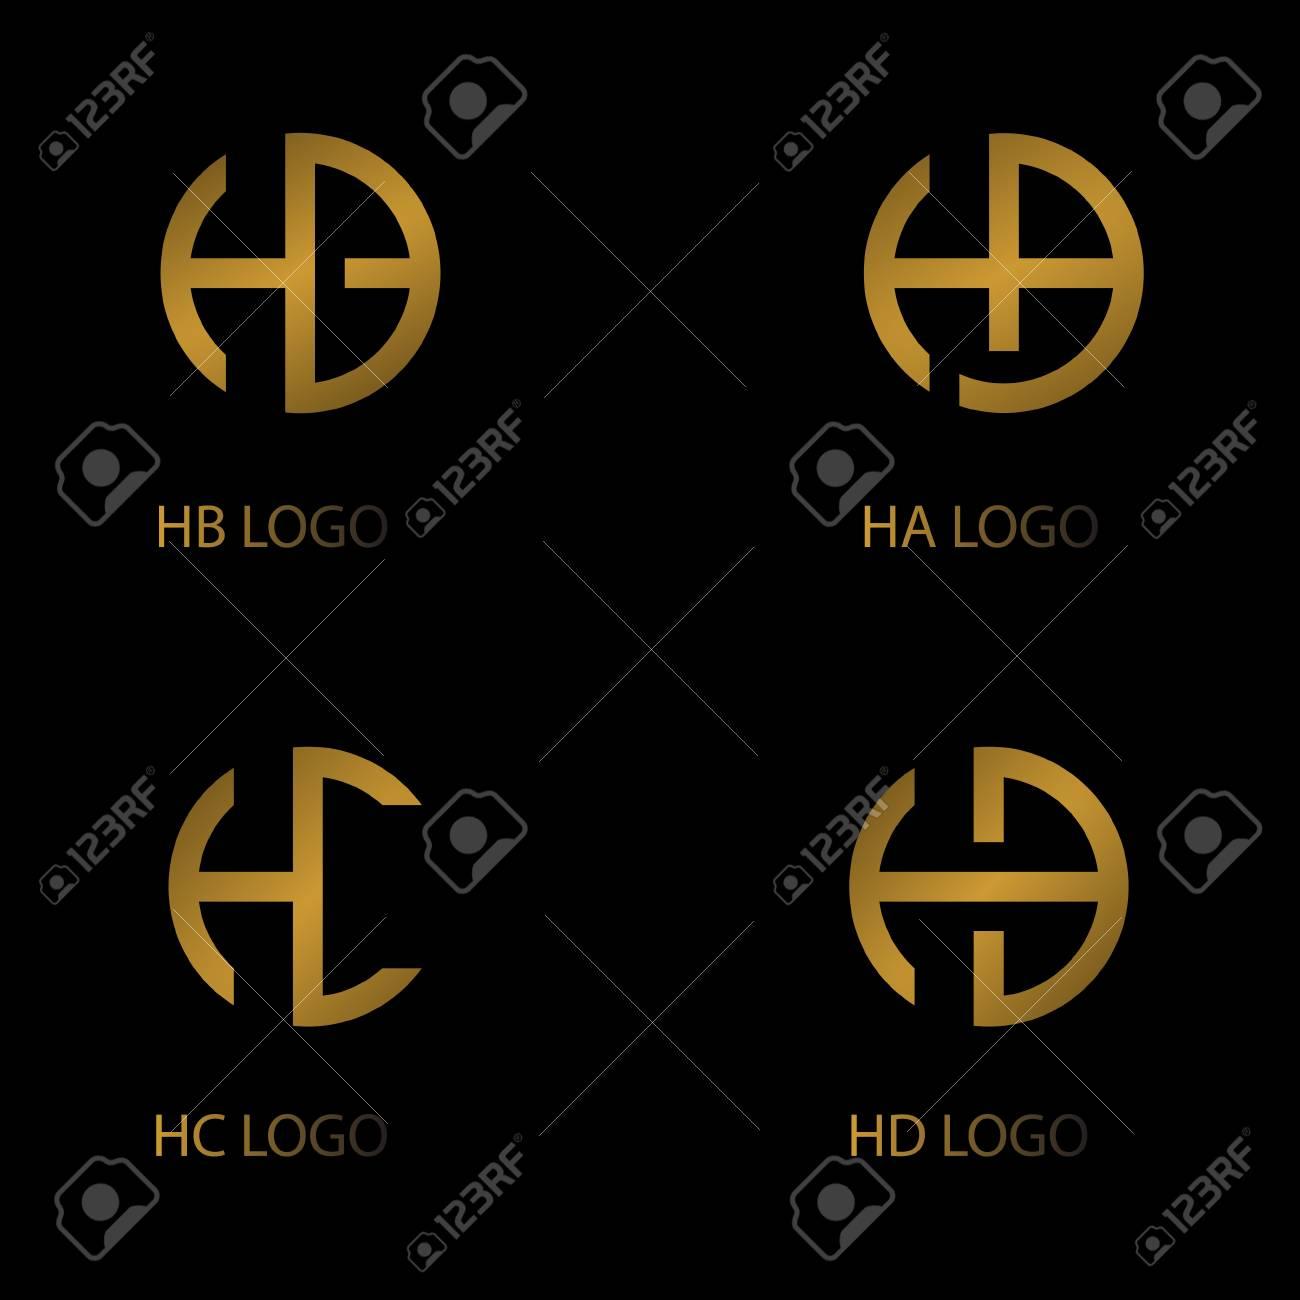 set letter logo, HA HB HC HD letter logo, company logo. - 115933172